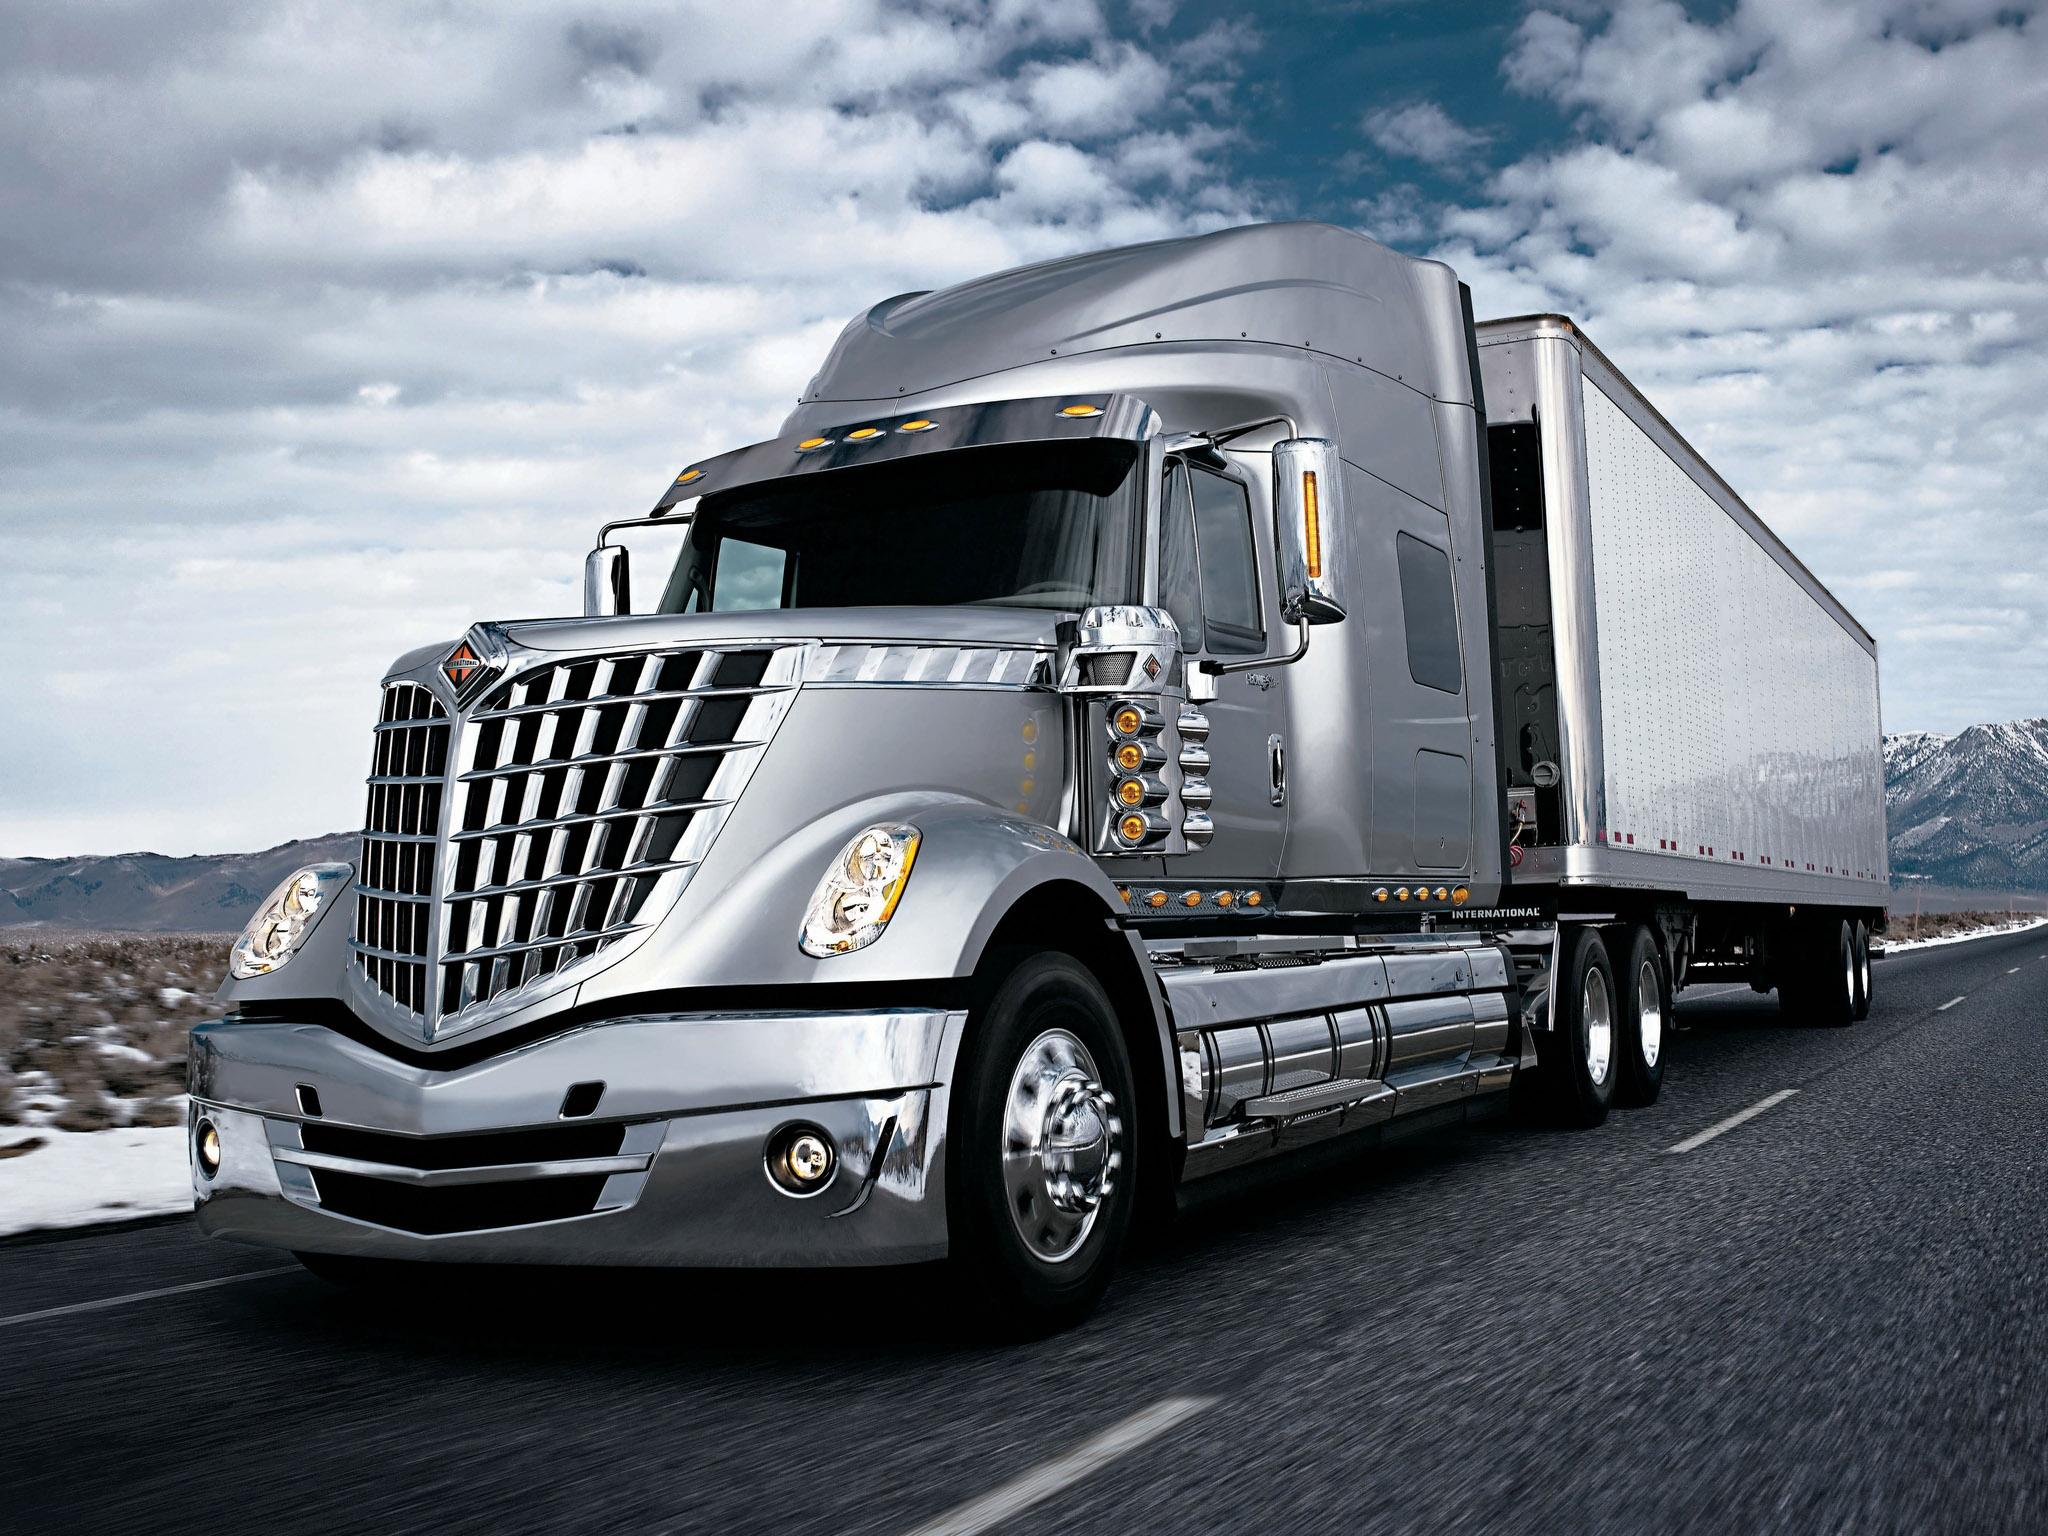 2008 international lonestar semi tractor truck transport f wallpaper 2048x1536 107958. Black Bedroom Furniture Sets. Home Design Ideas